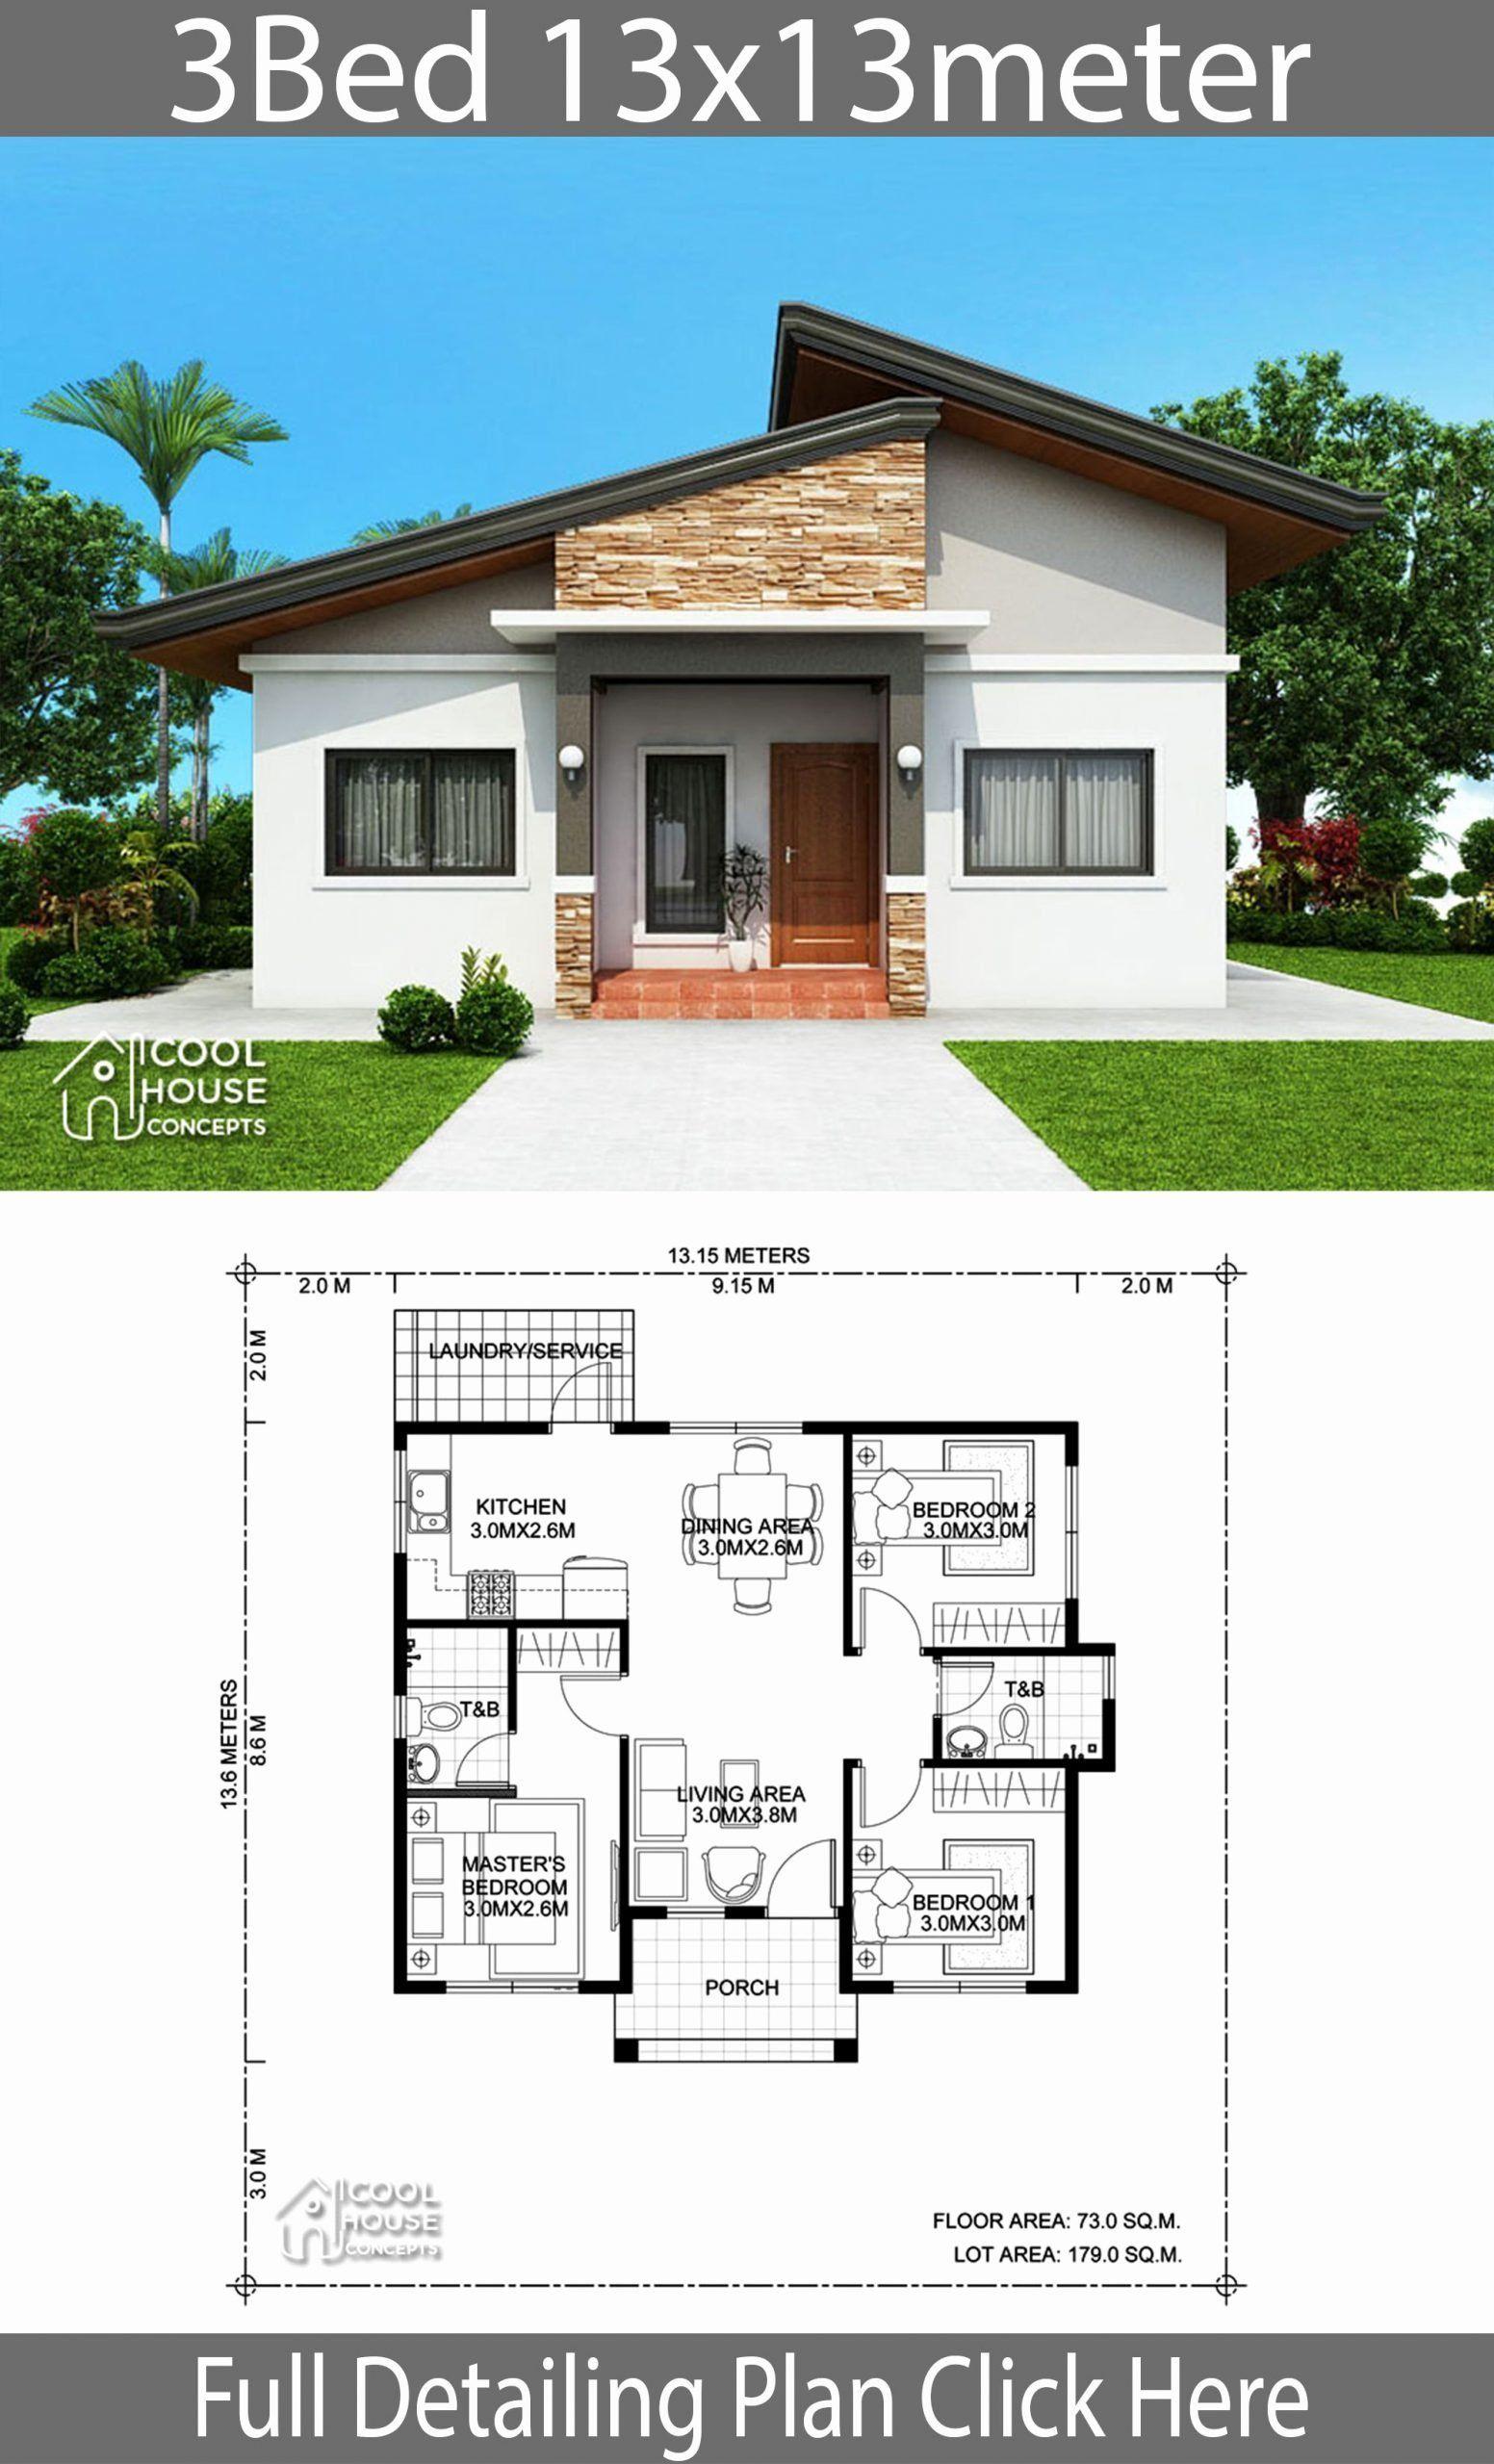 Three Bedroom House Floor Plan Elegant 5 Home Plans 11x13m 11x14m 12x10m 13x12m 13x13m Siban B In 2020 Bungalow House Design Modern Bungalow House House Front Design